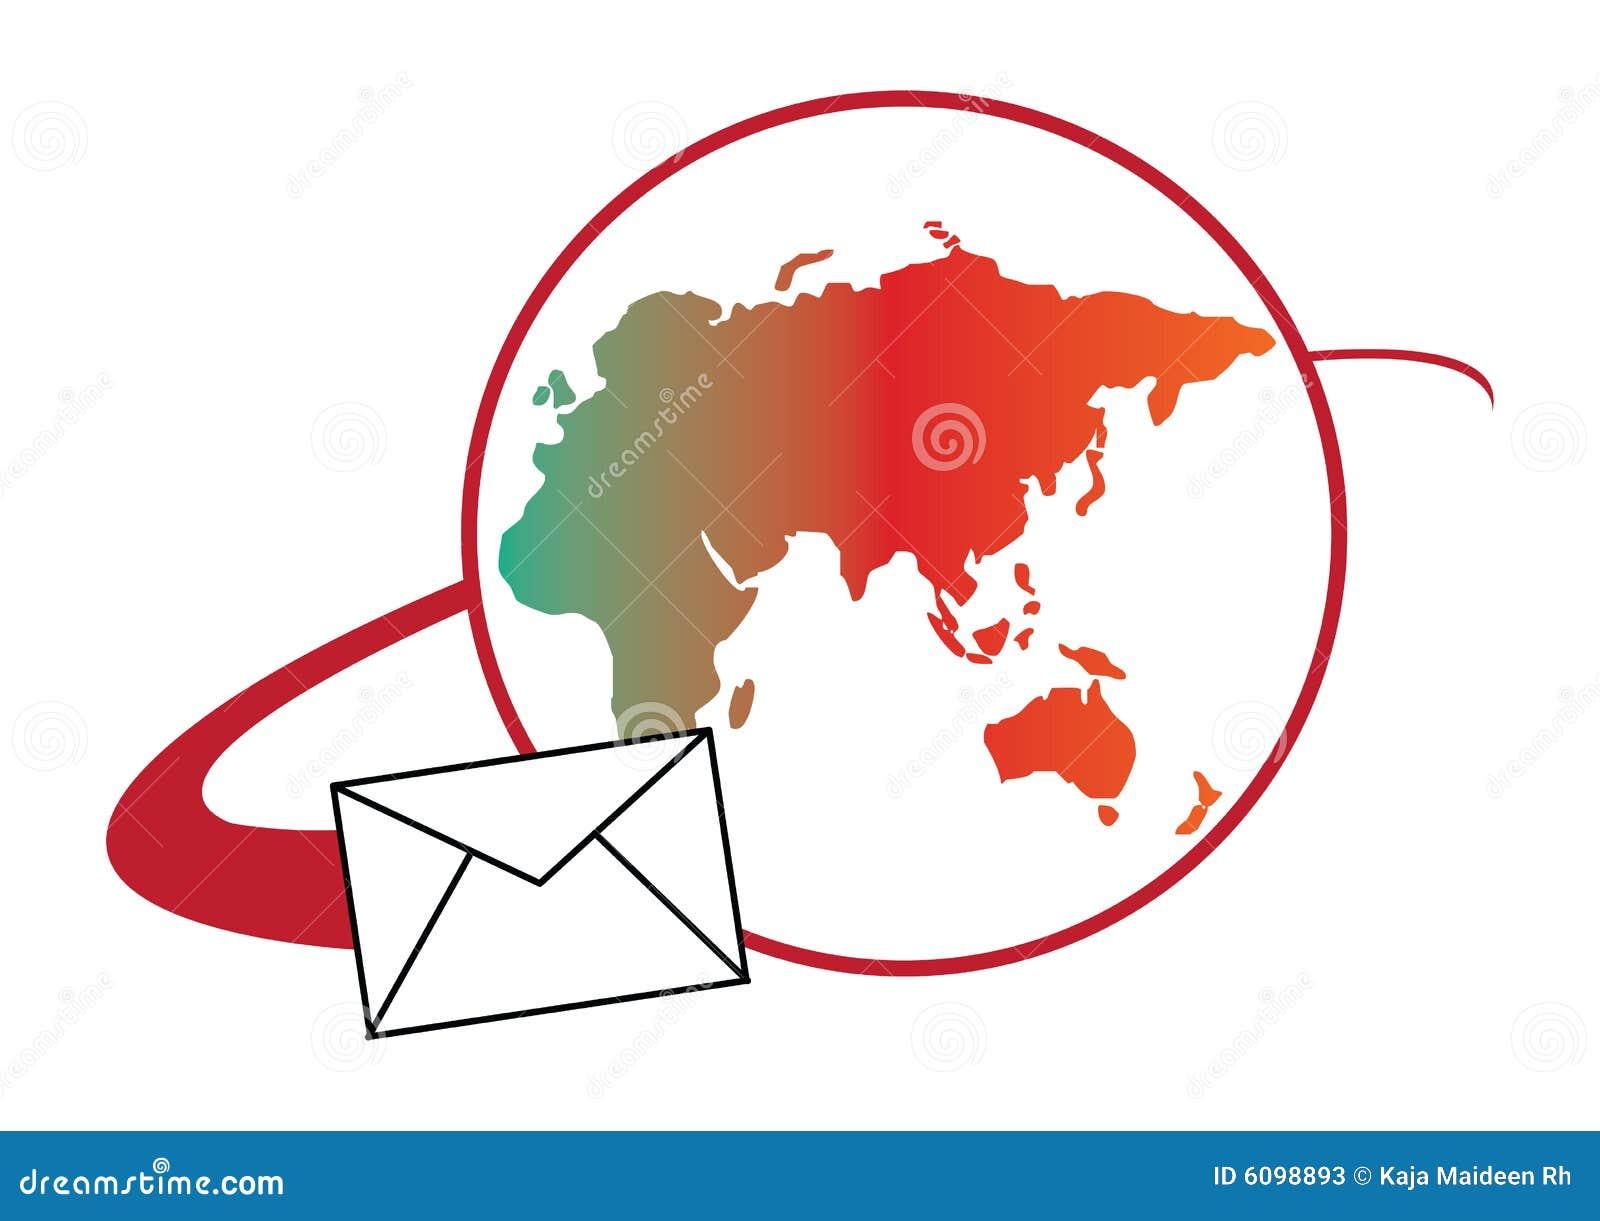 global mail logo concept stock photos image 6098893. Black Bedroom Furniture Sets. Home Design Ideas